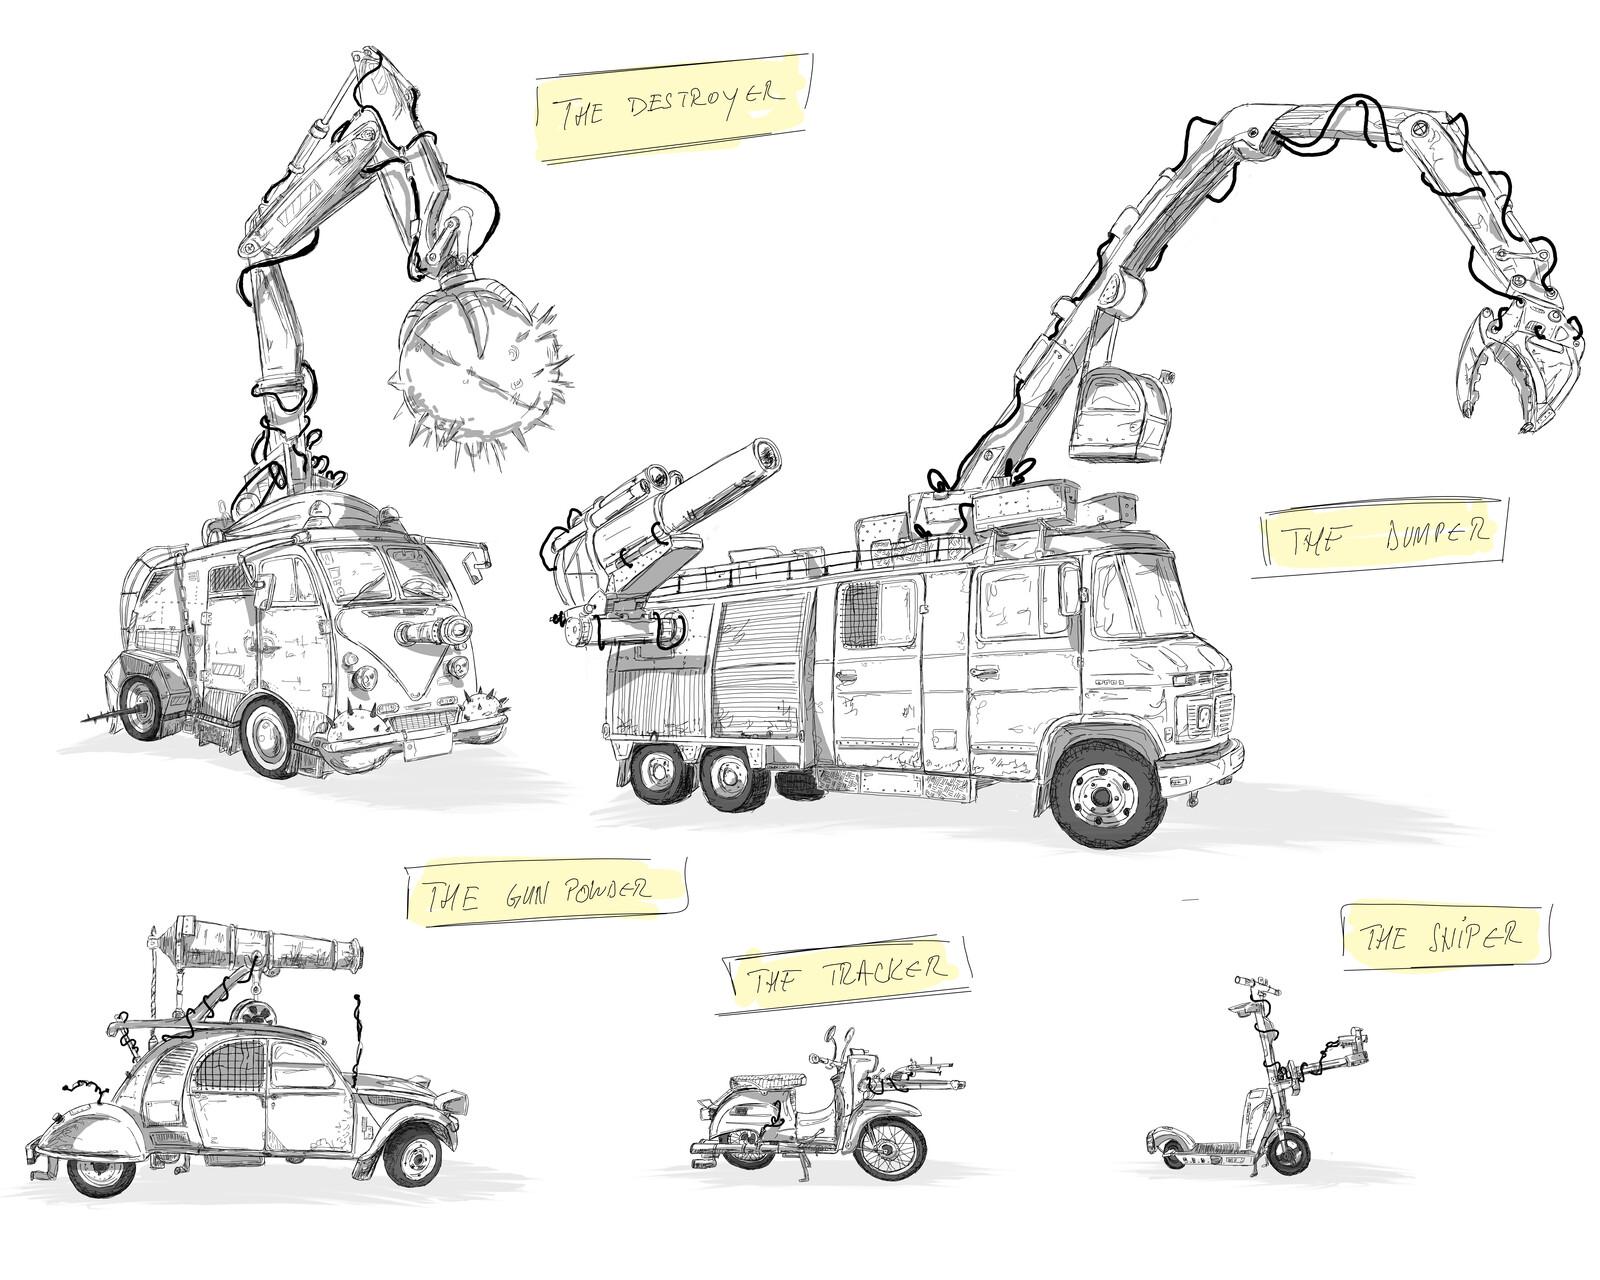 Five Wacky Racing Vehicles